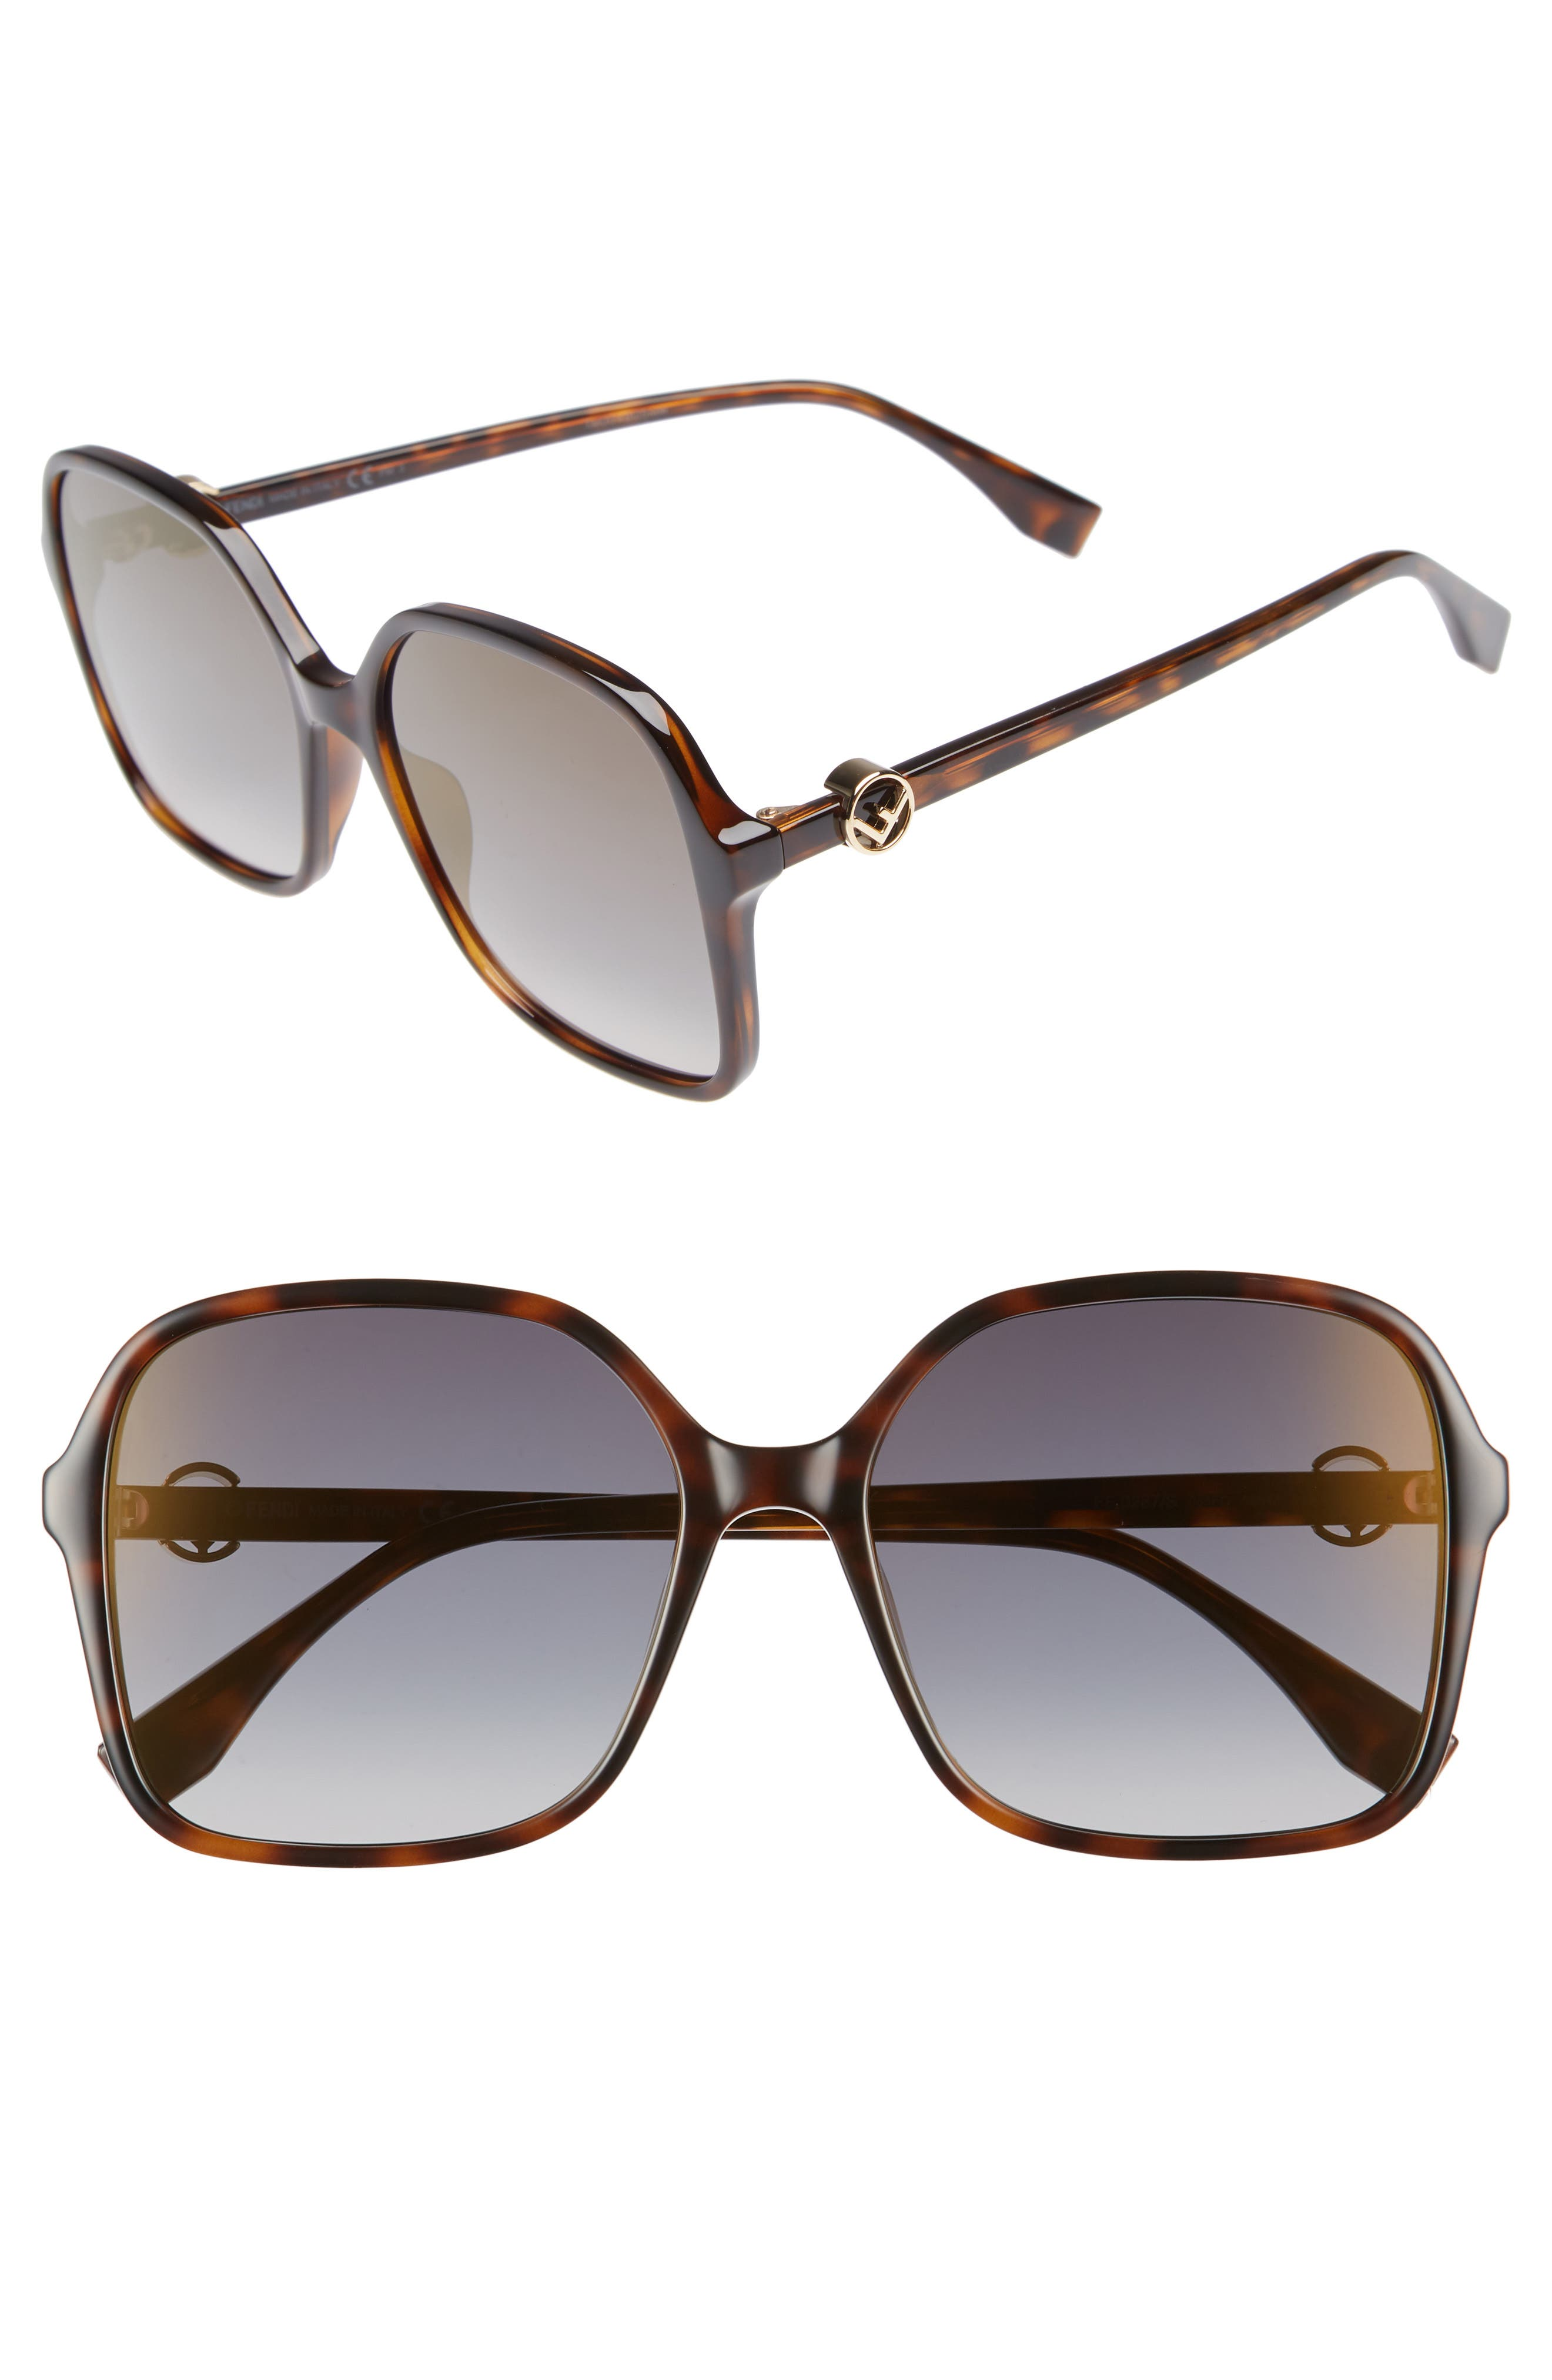 58mm Square Sunglasses,                         Main,                         color, Dark Havana